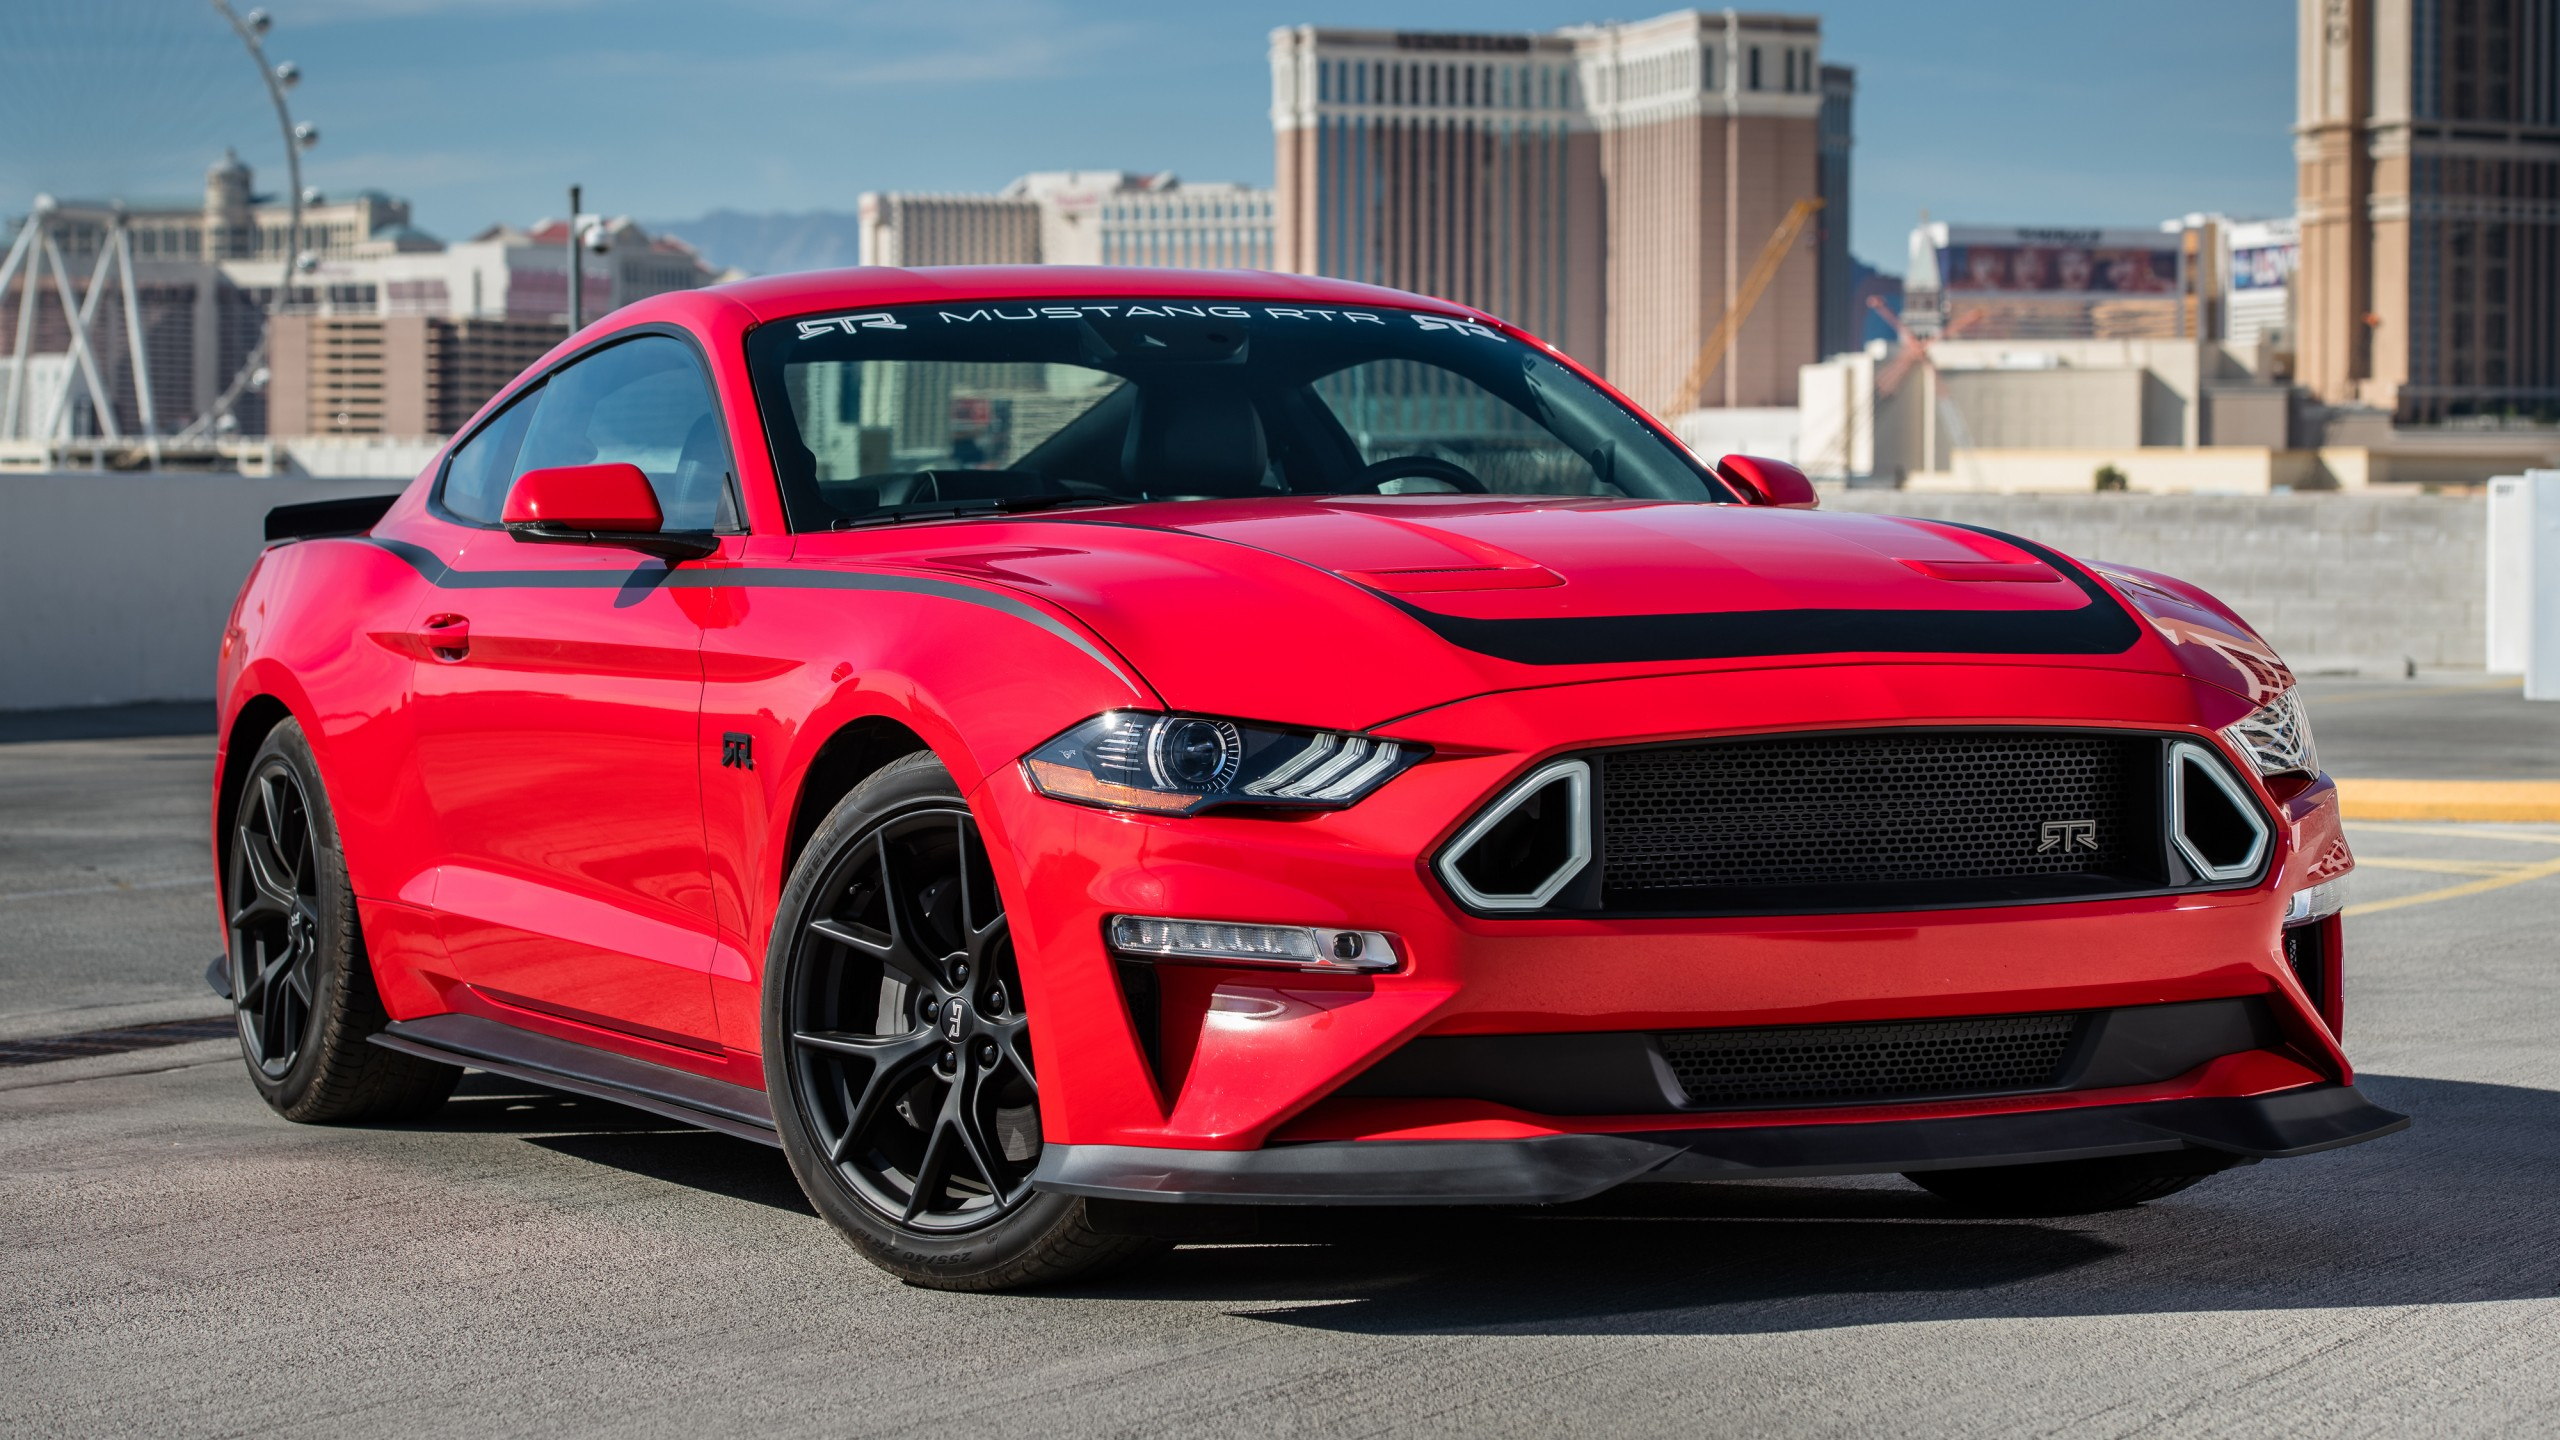 2019 Ford Series 1 Mustang RTR 4K Wallpaper | HD Car ...